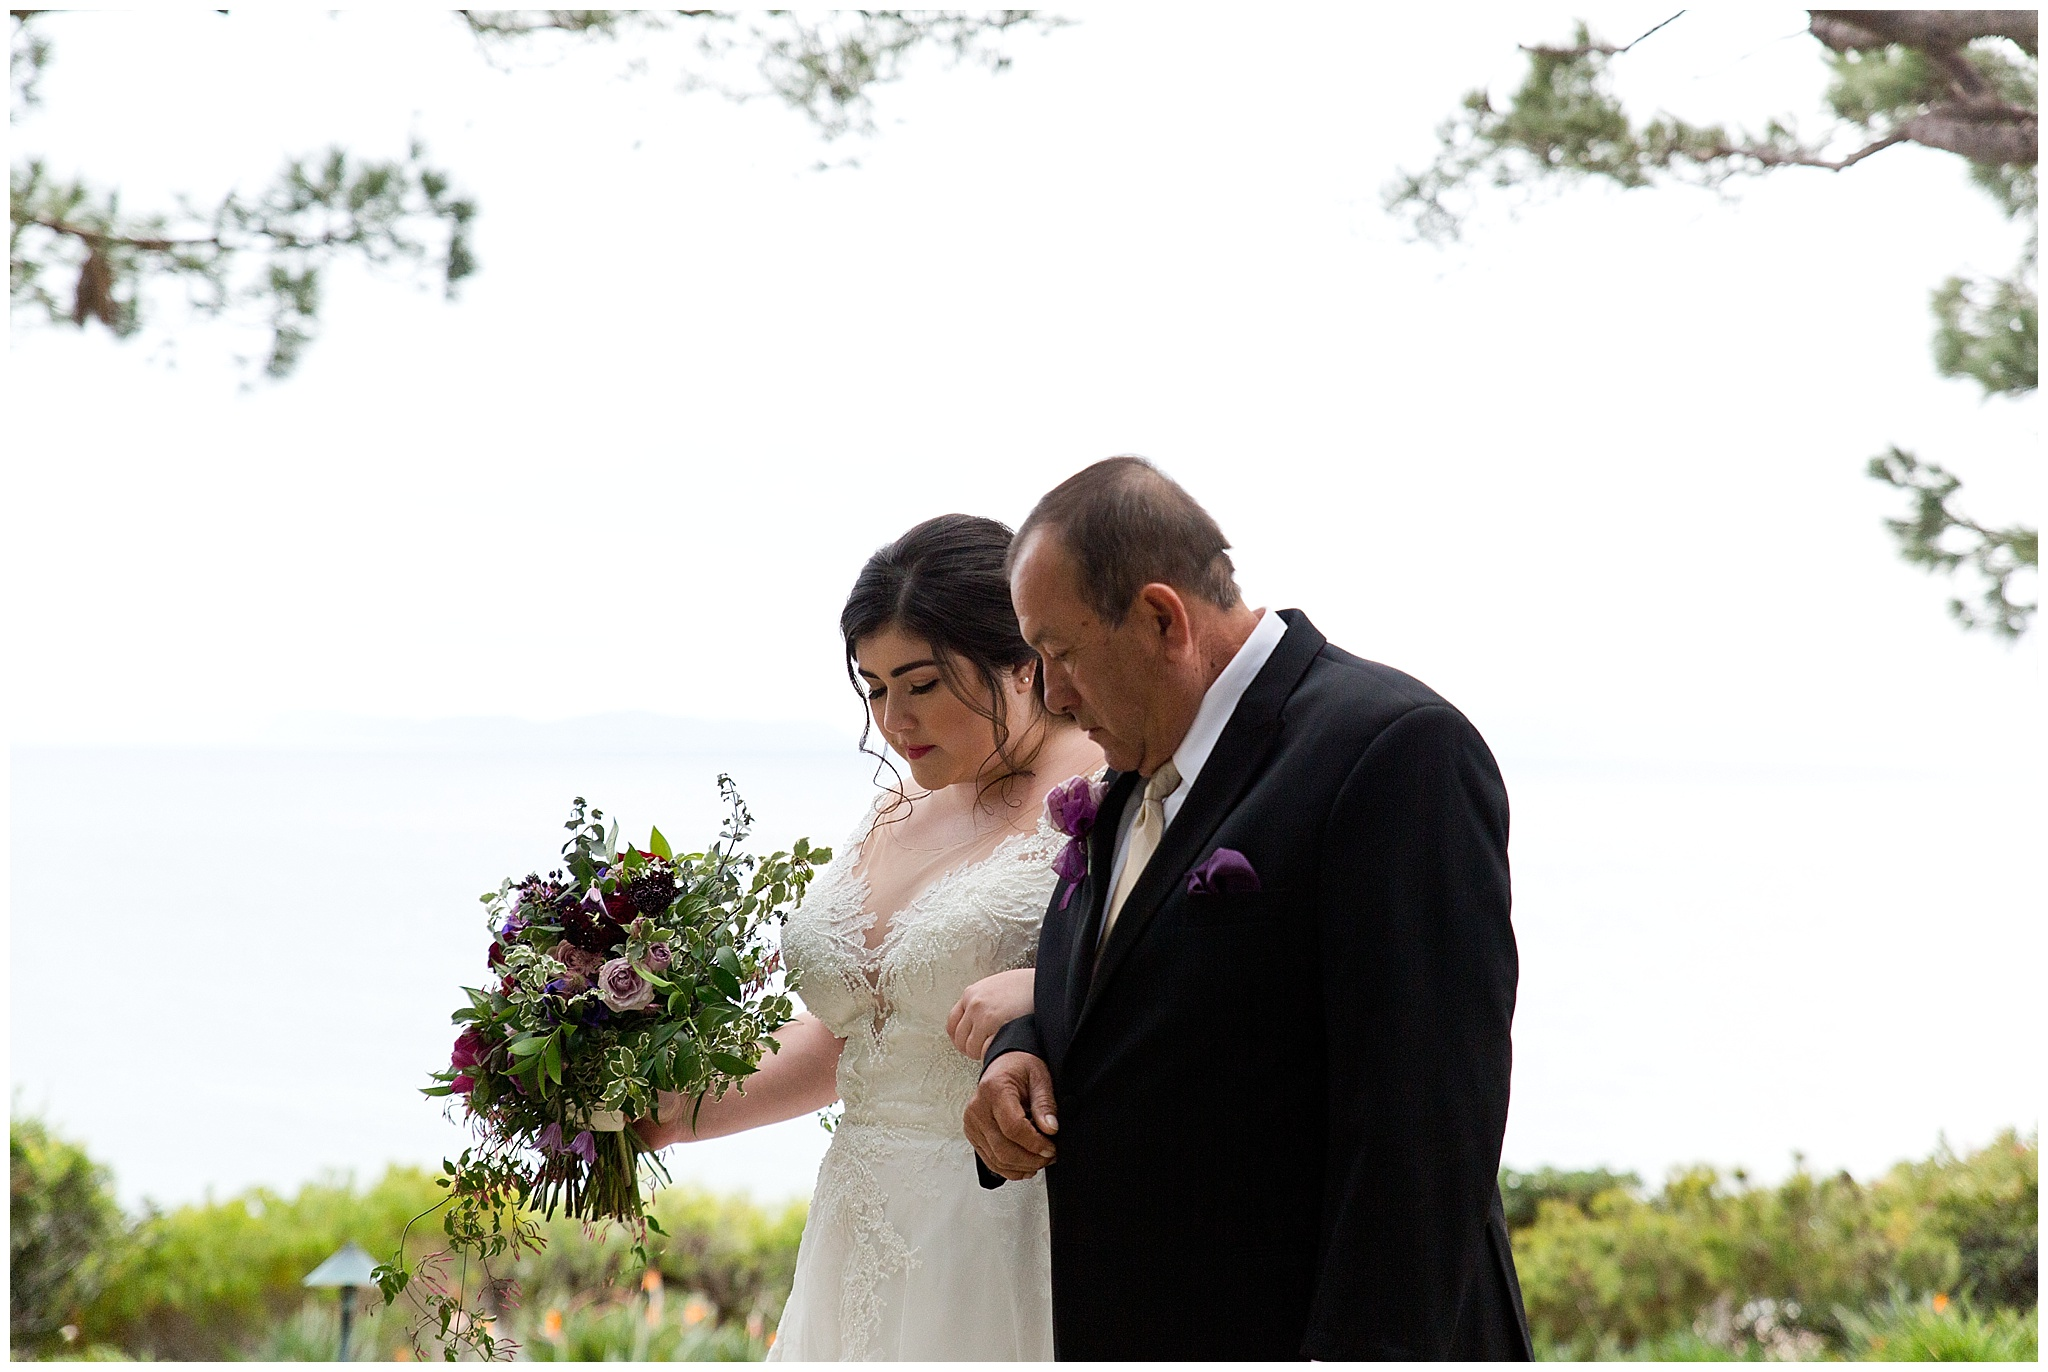 Carol_and_Grant_Wedding_3-3-18-8172.jpg